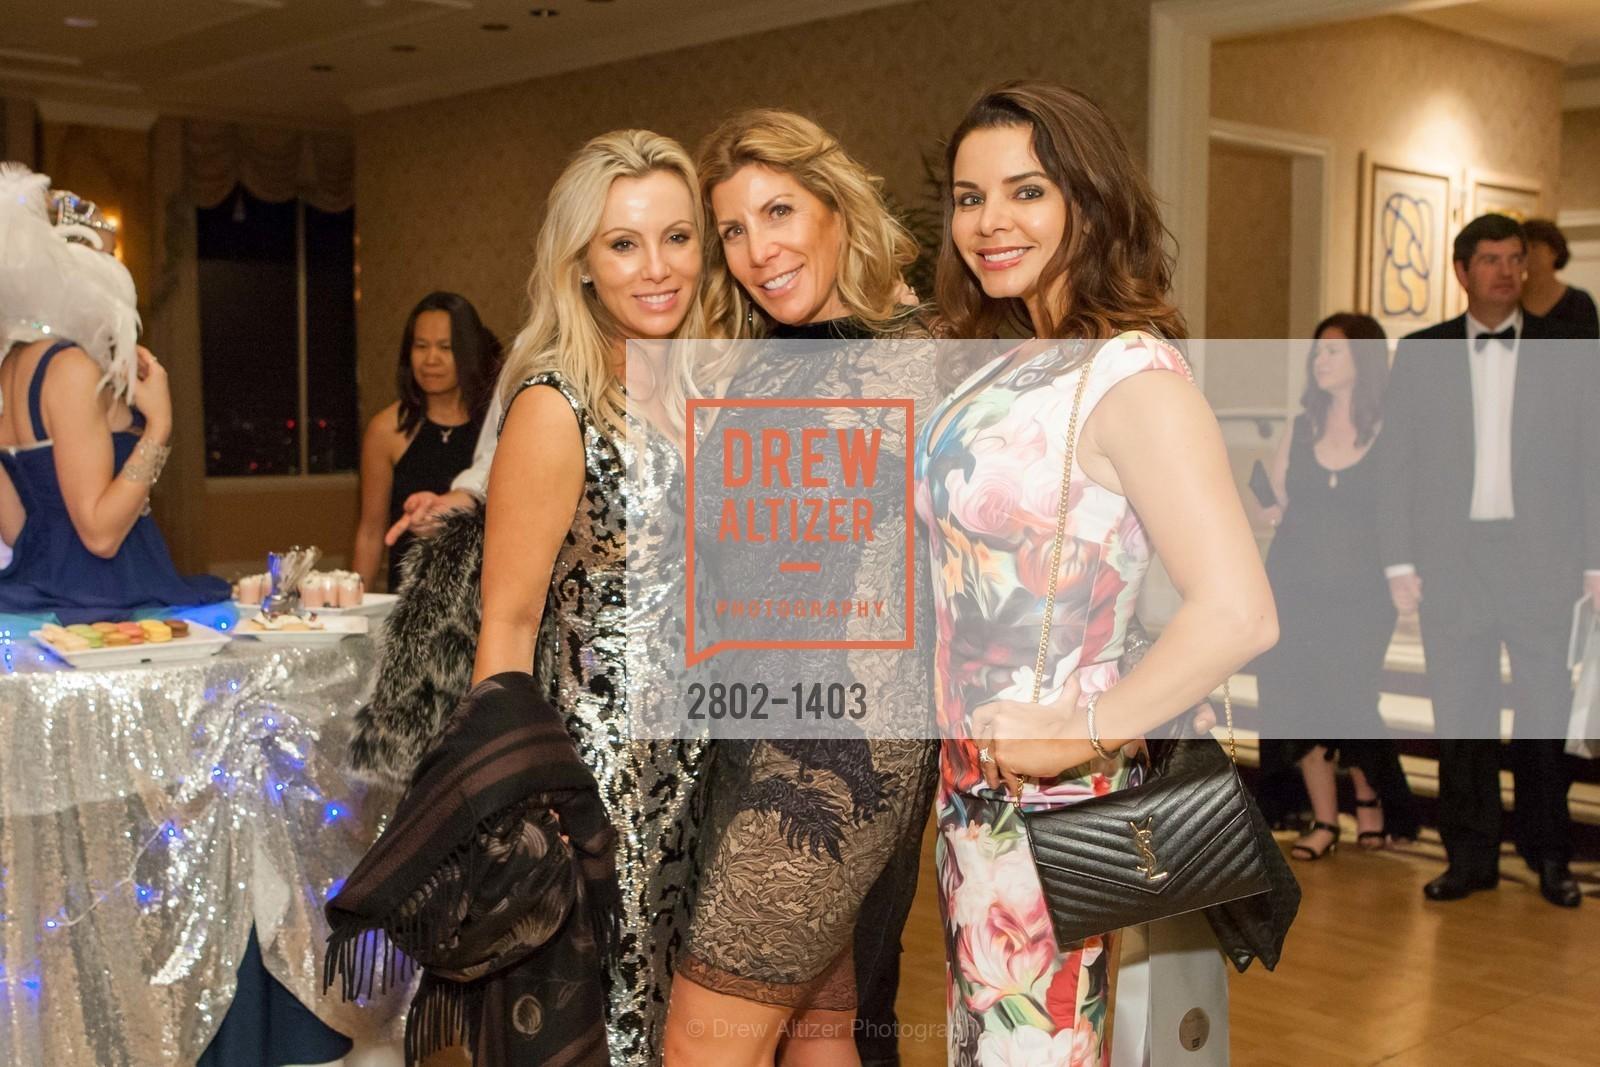 Amy Steele, Lori Pryt, Christine Merritt, Photo #2802-1403